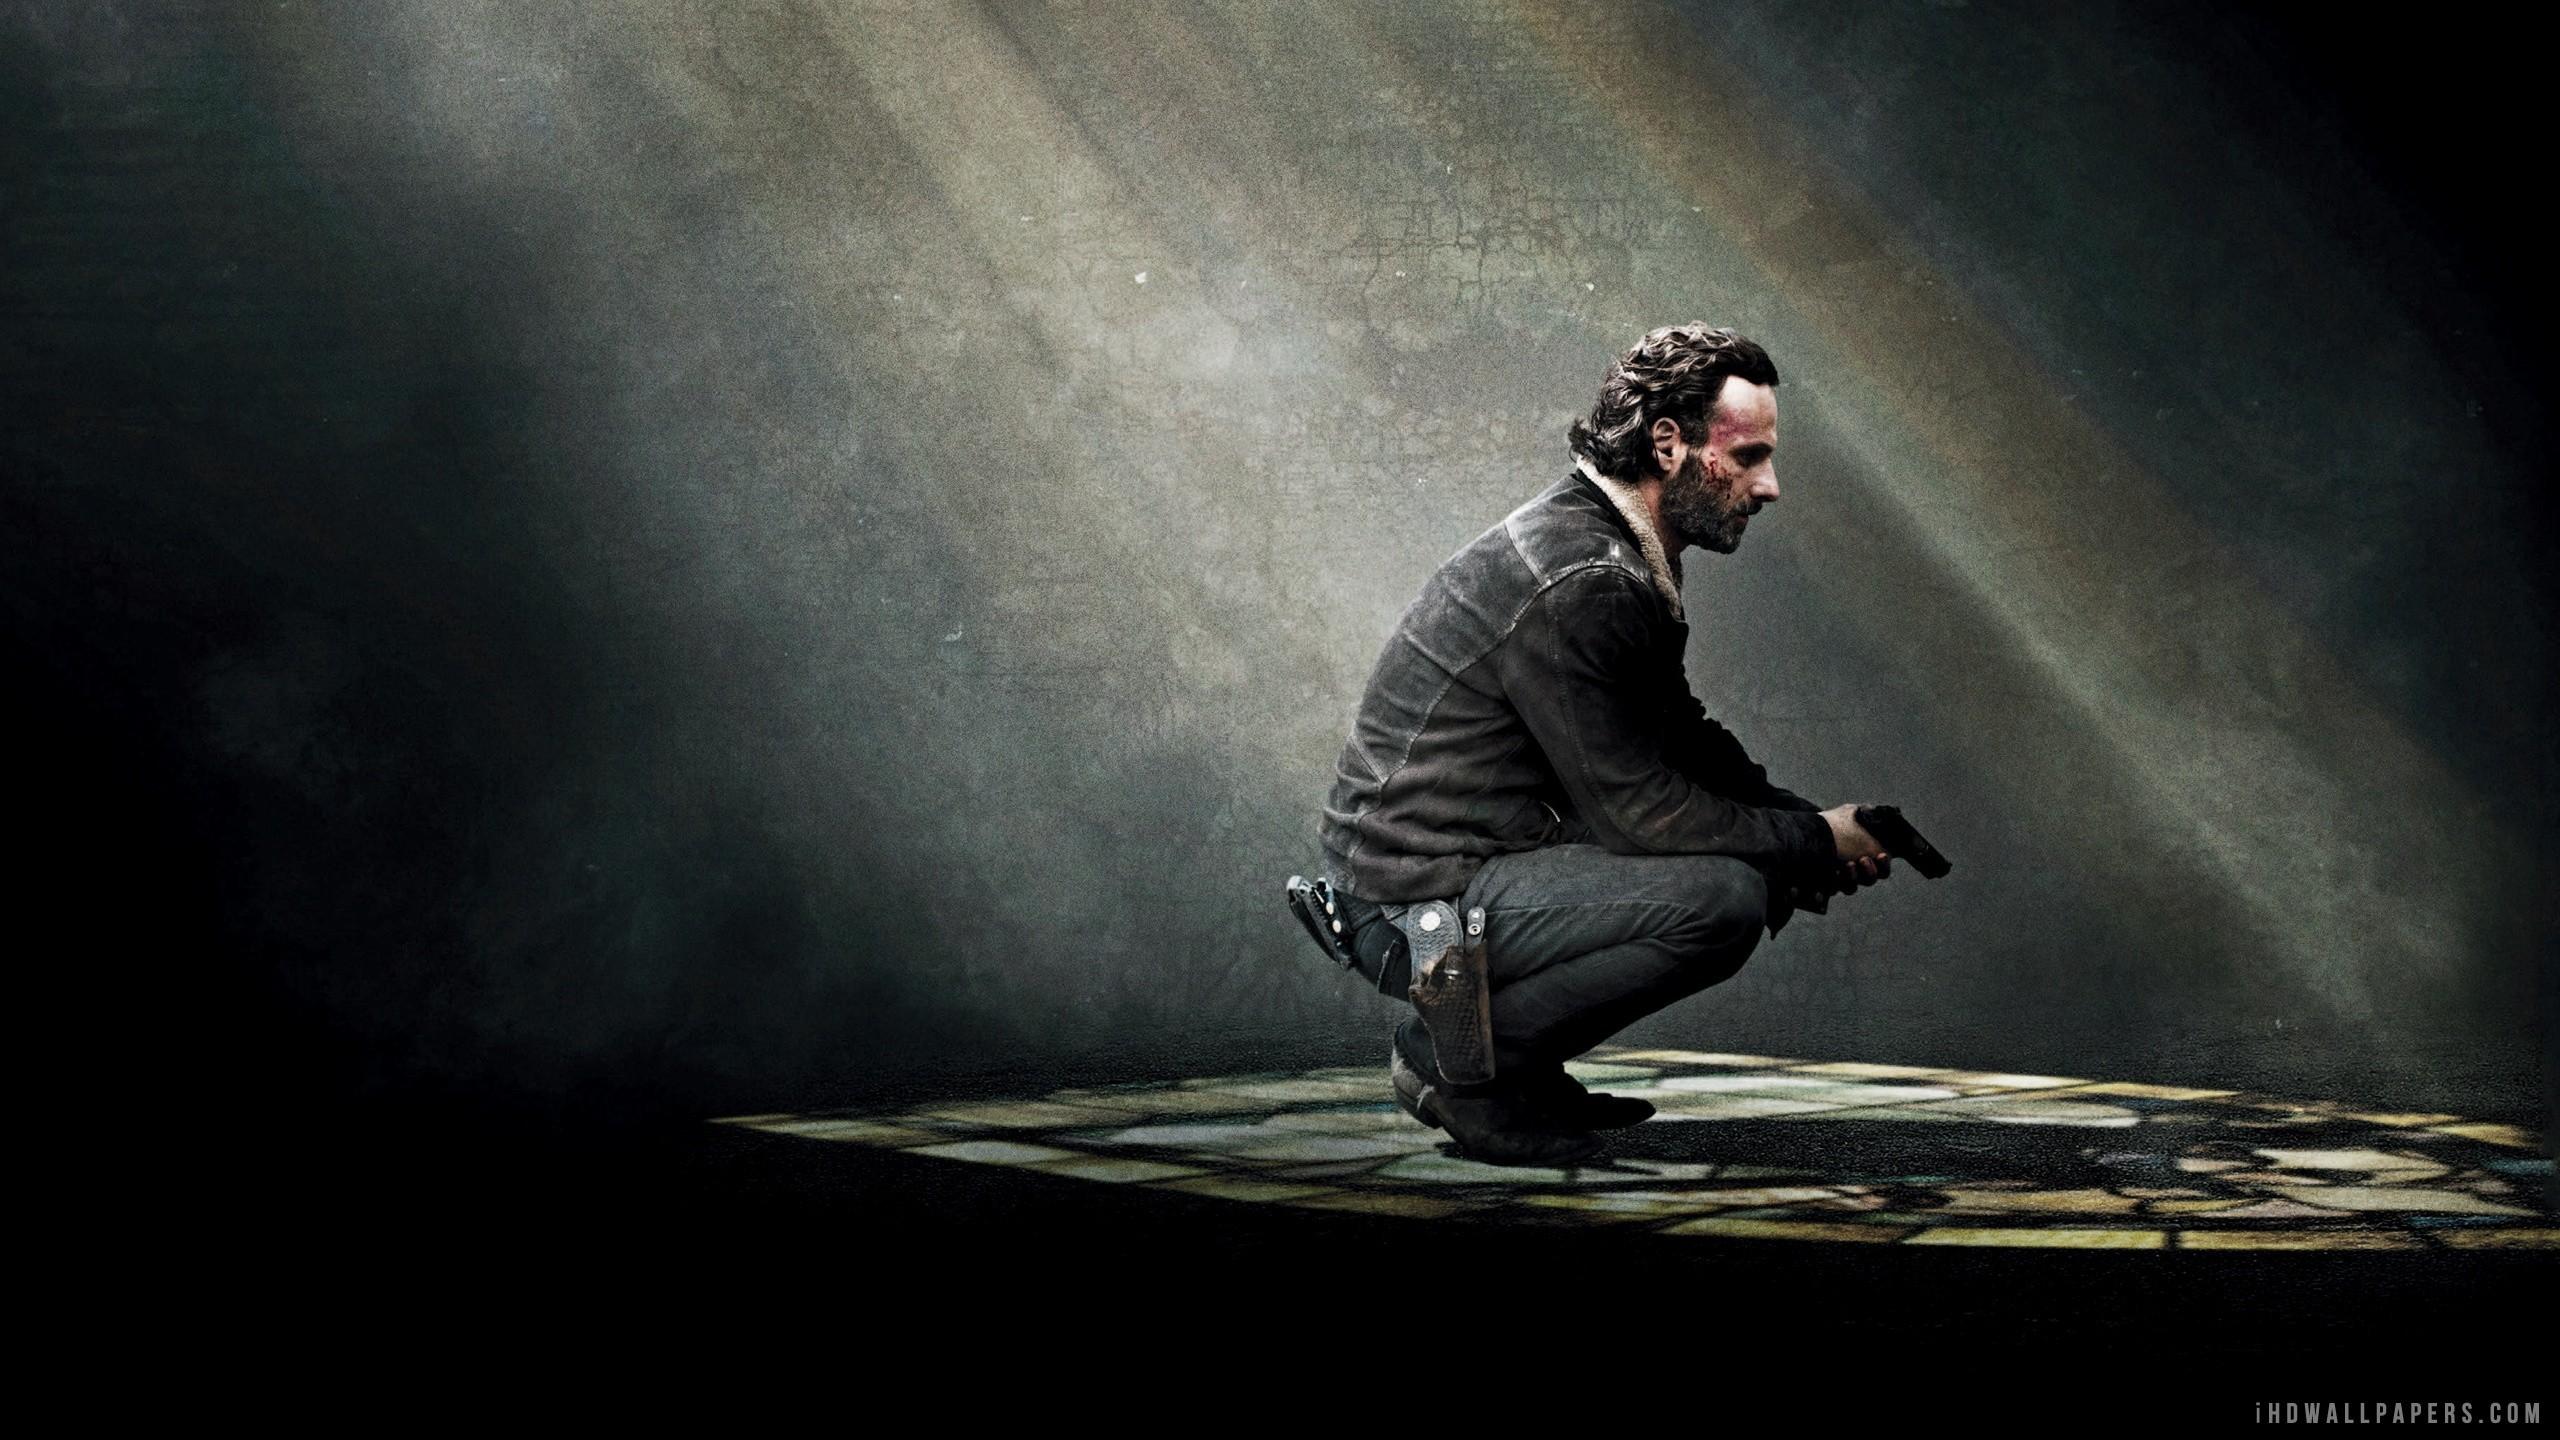 undefined The Walking Dead Wallpapers 1920×1080 (51 Wallpapers) | Adorable  Wallpapers | Desktop | Pinterest | Walking dead wallpaper